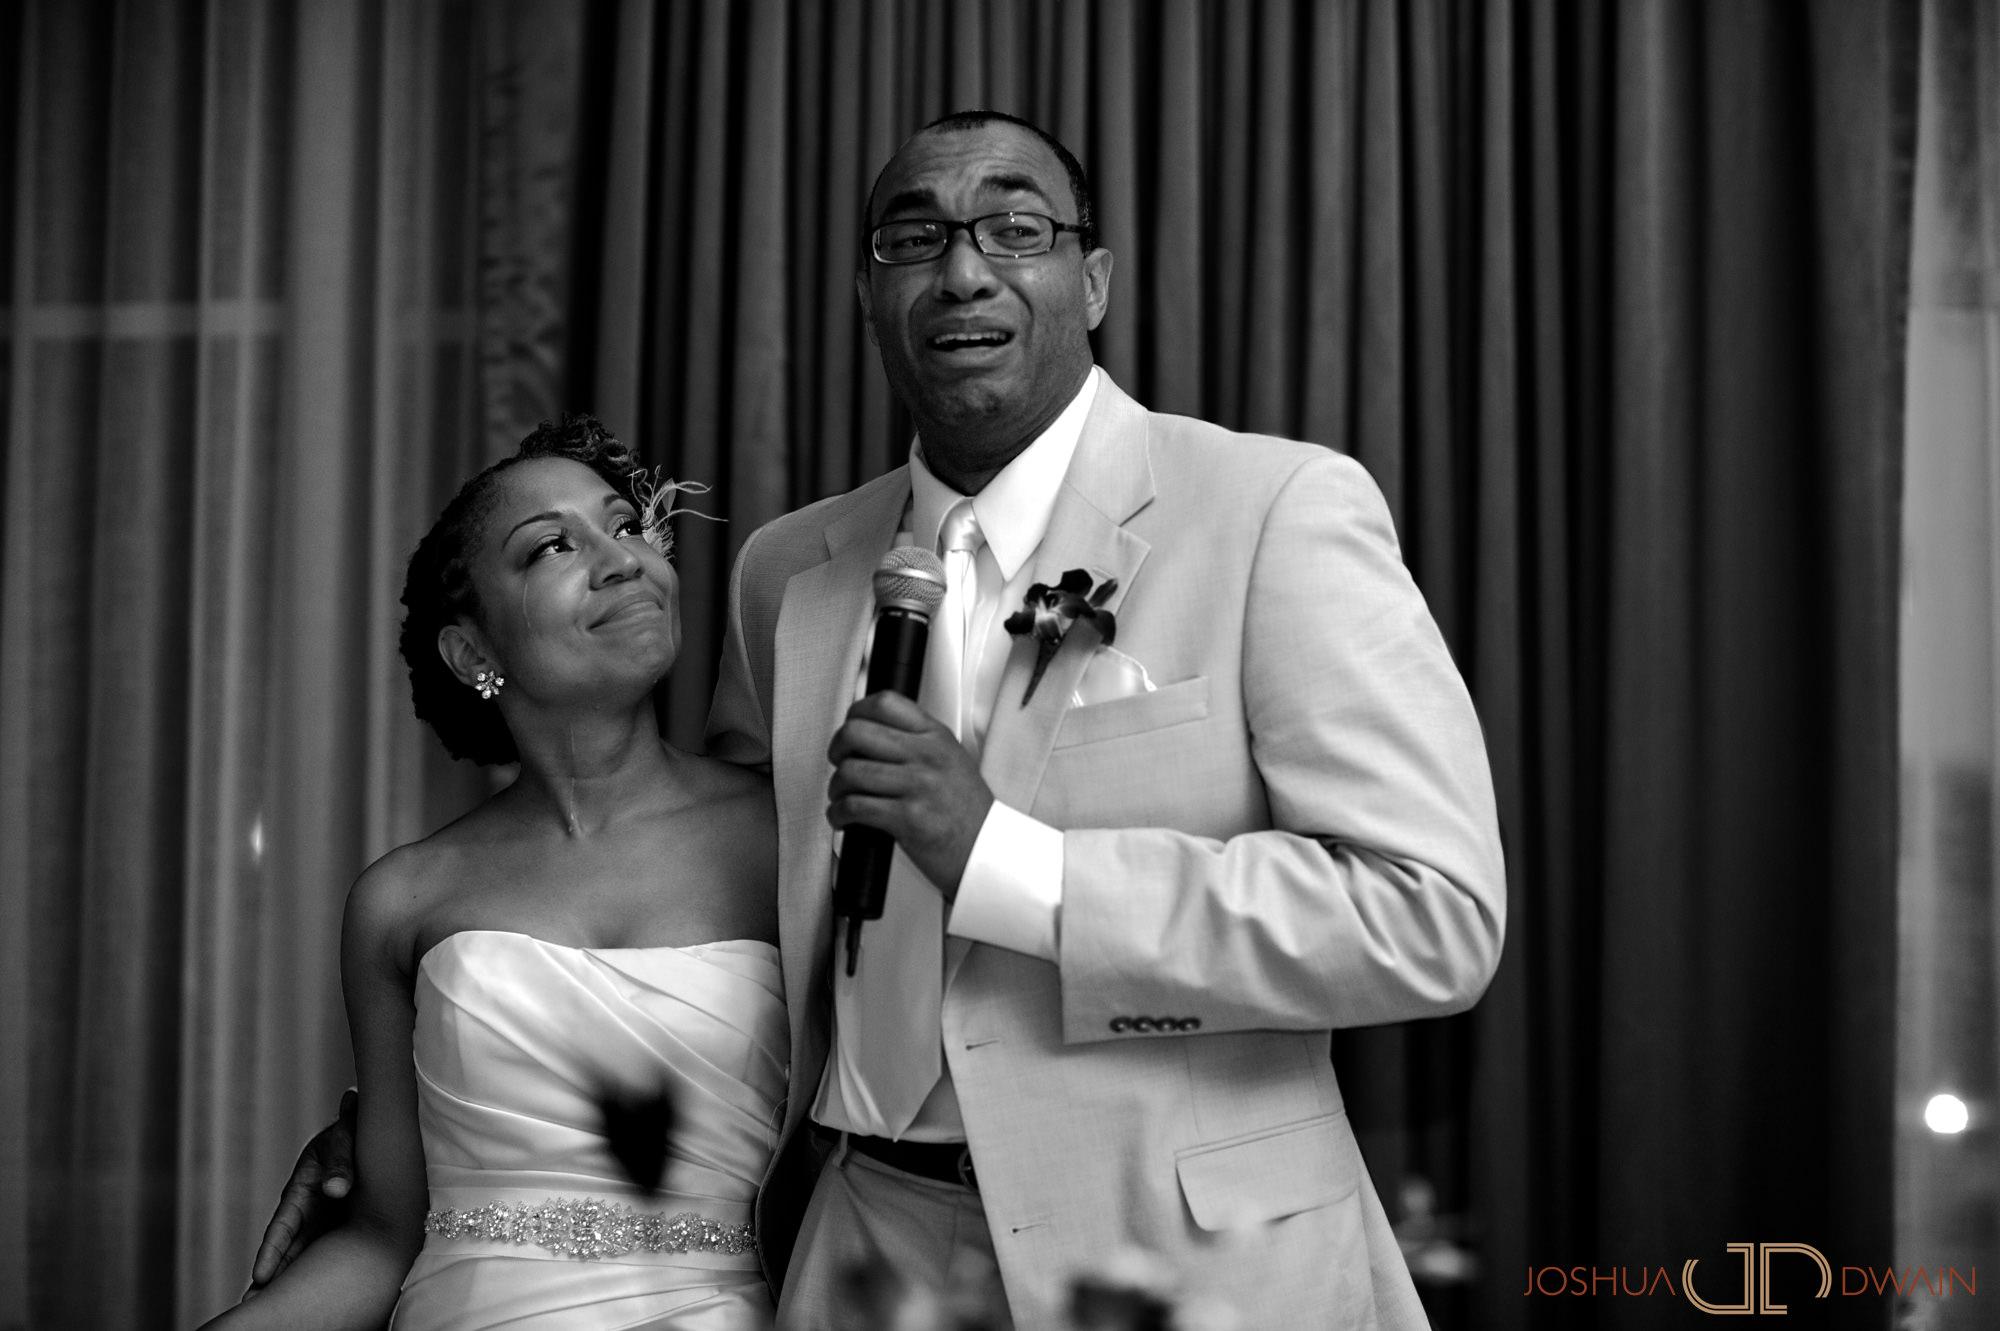 candra-alonza-011-holiday-inn-south-beach-miami-wedding-photographer-joshua-dwain-2012-07-28_ca_323